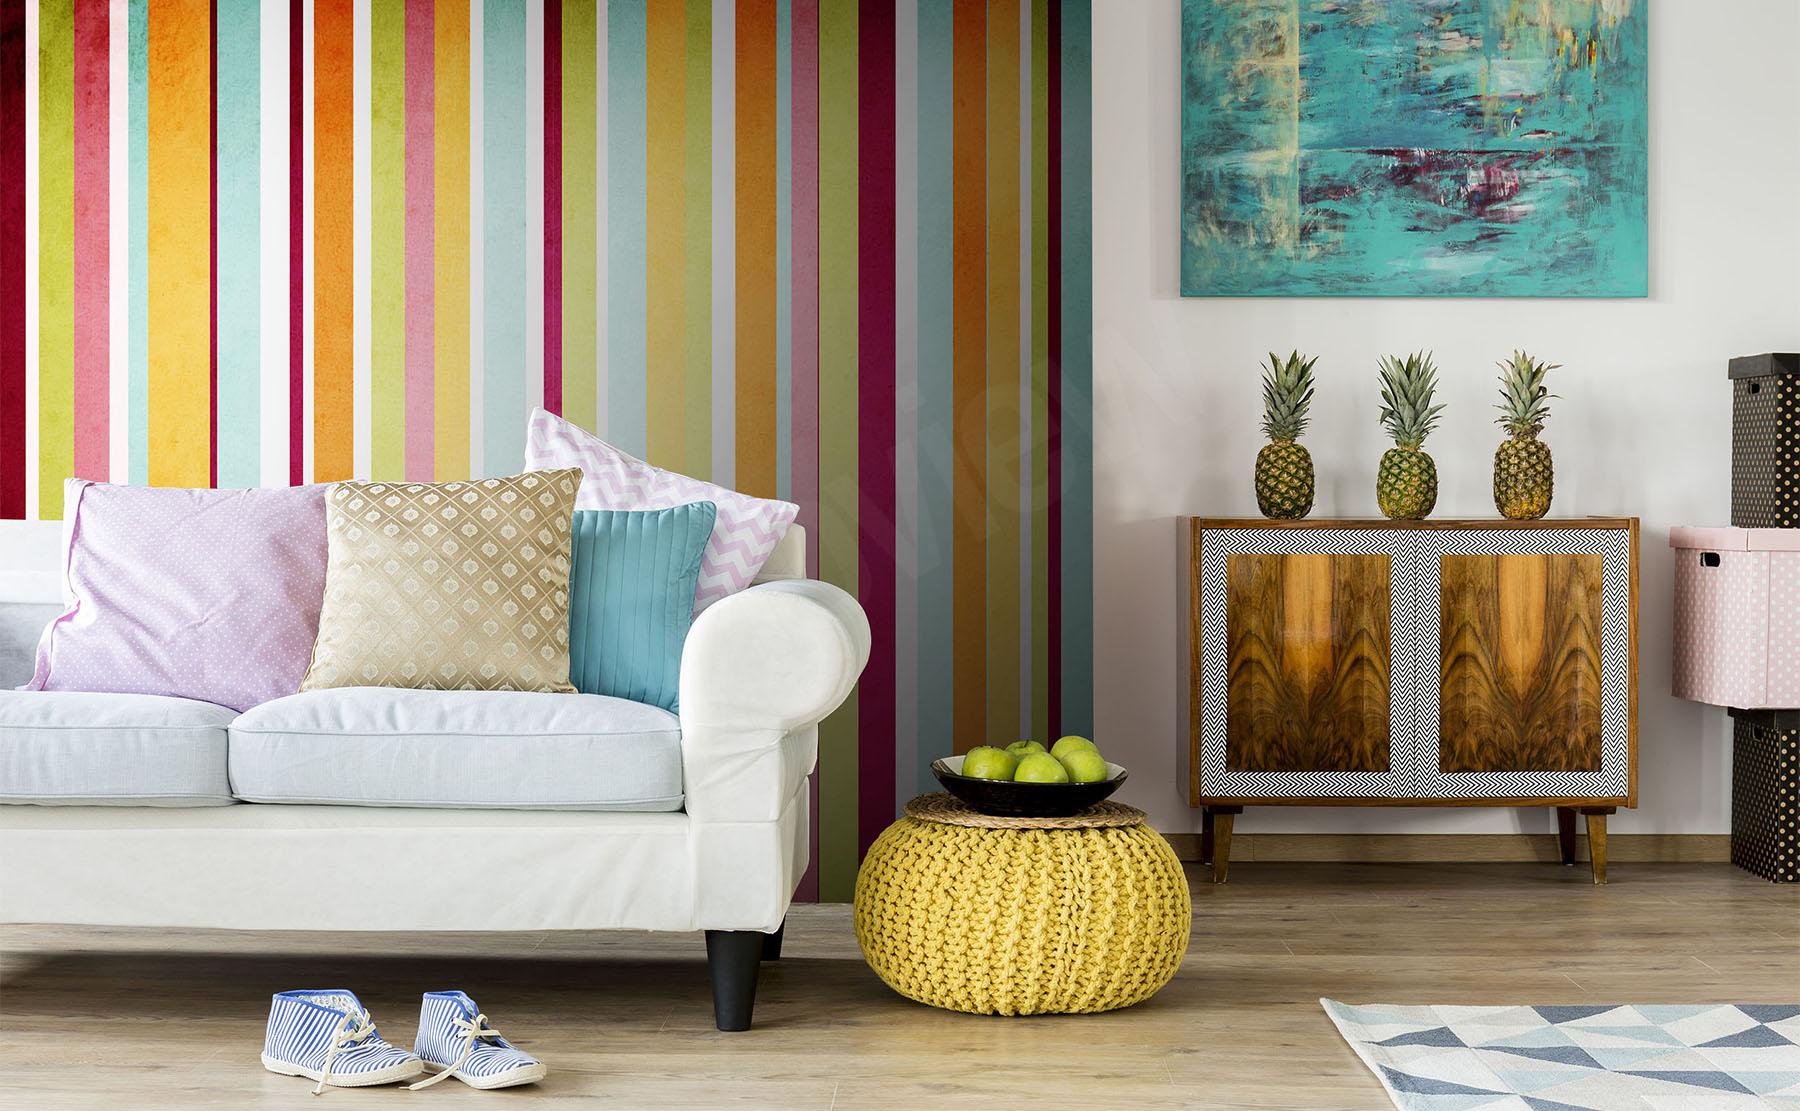 fototapeten streifen gr e der wand. Black Bedroom Furniture Sets. Home Design Ideas